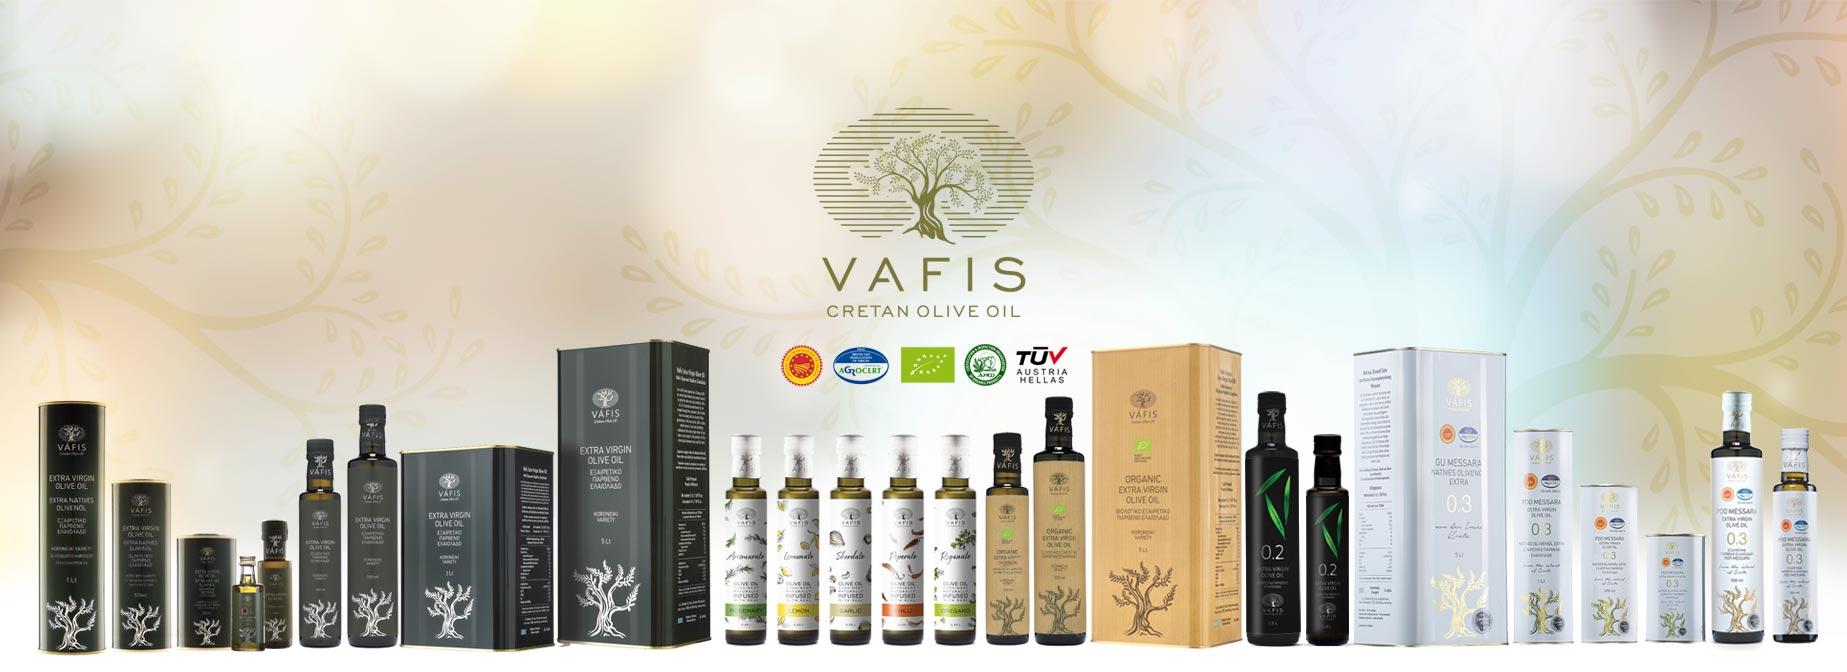 Vafis 0.2 Εξαιρετικό Παρθένο Ελαιόλαδο